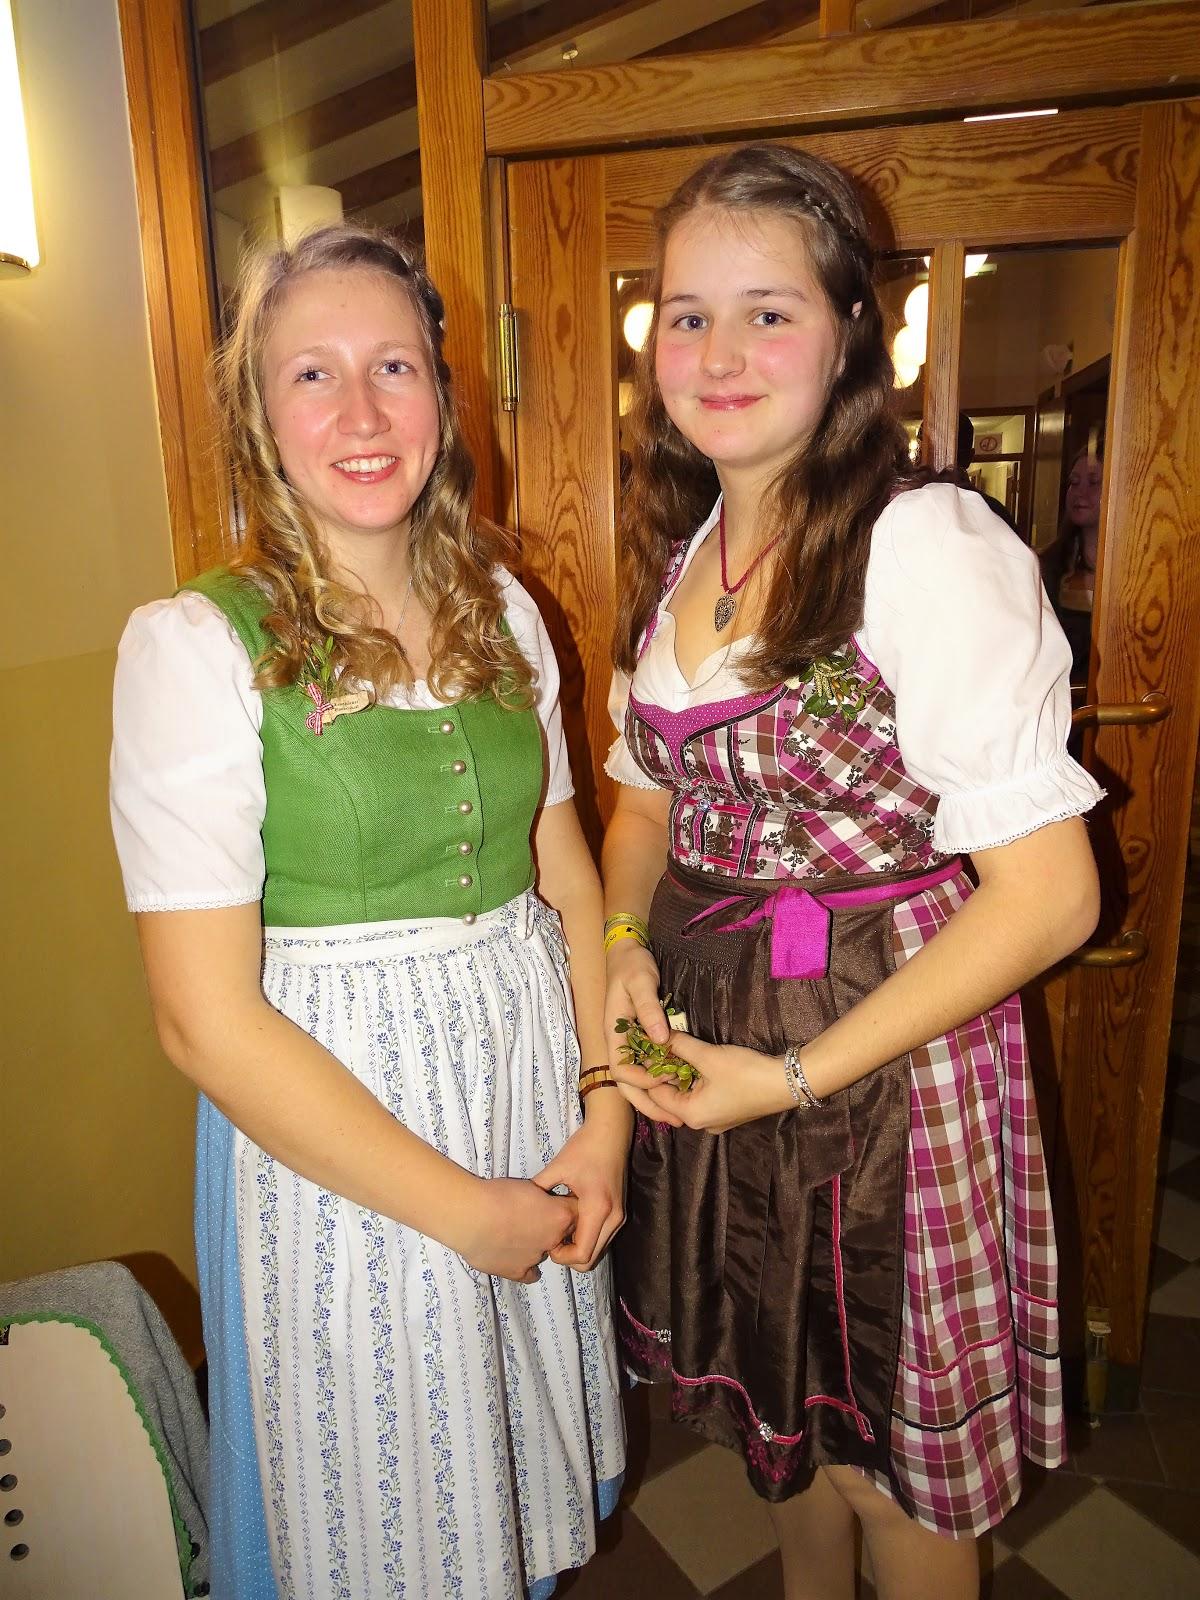 ,,die Bar Prisse Bad St. Leonhard Public Group | Facebook